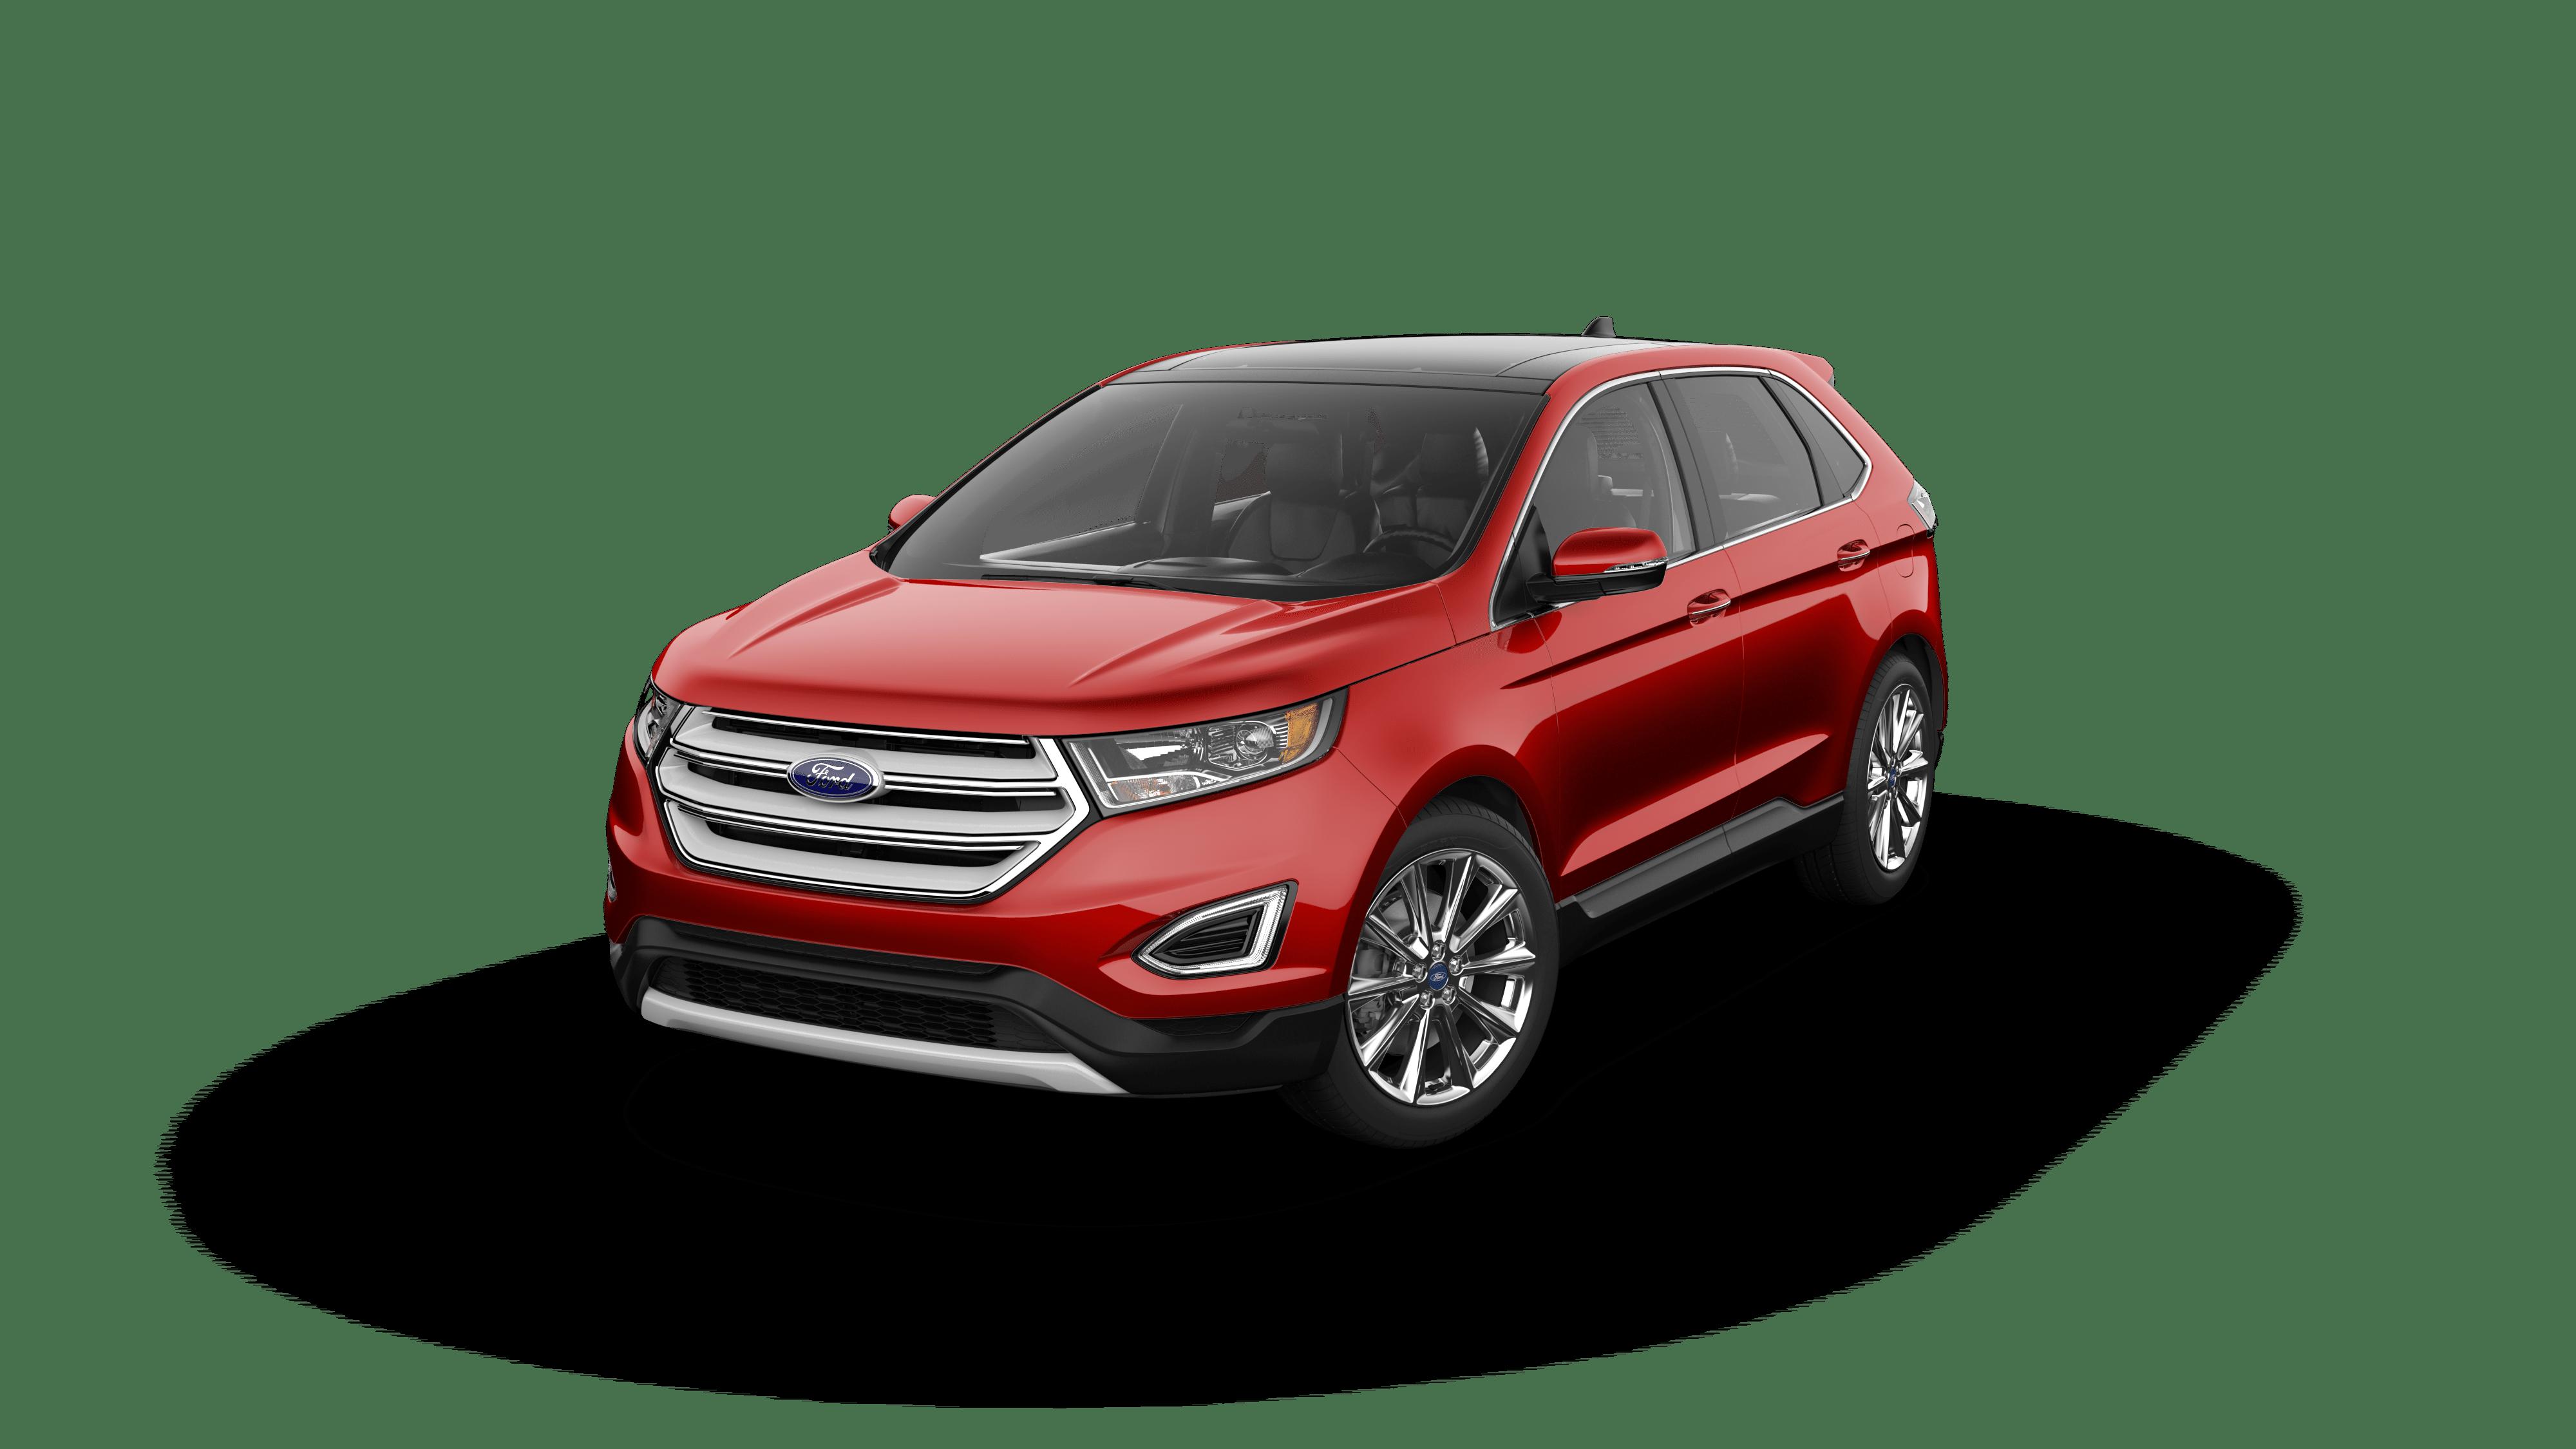 2018 Ford Edge For Sale In New Martinsville 2fmpk4k94jbc05635